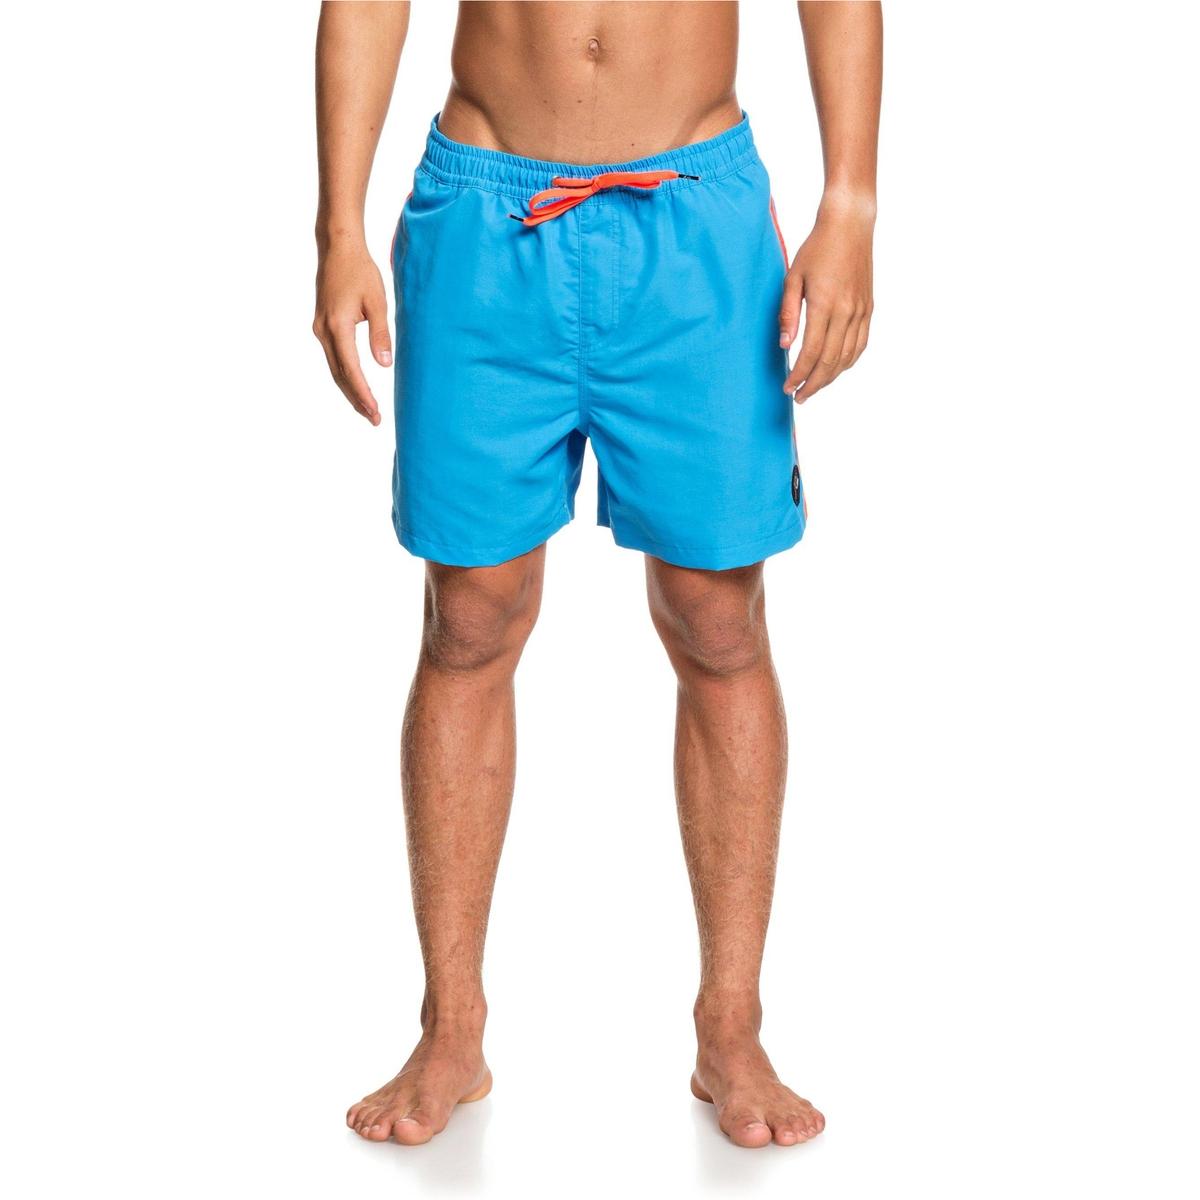 Шорты La Redoute Пляжные Beach Please XL синий шорты la redoute la redoute m синий